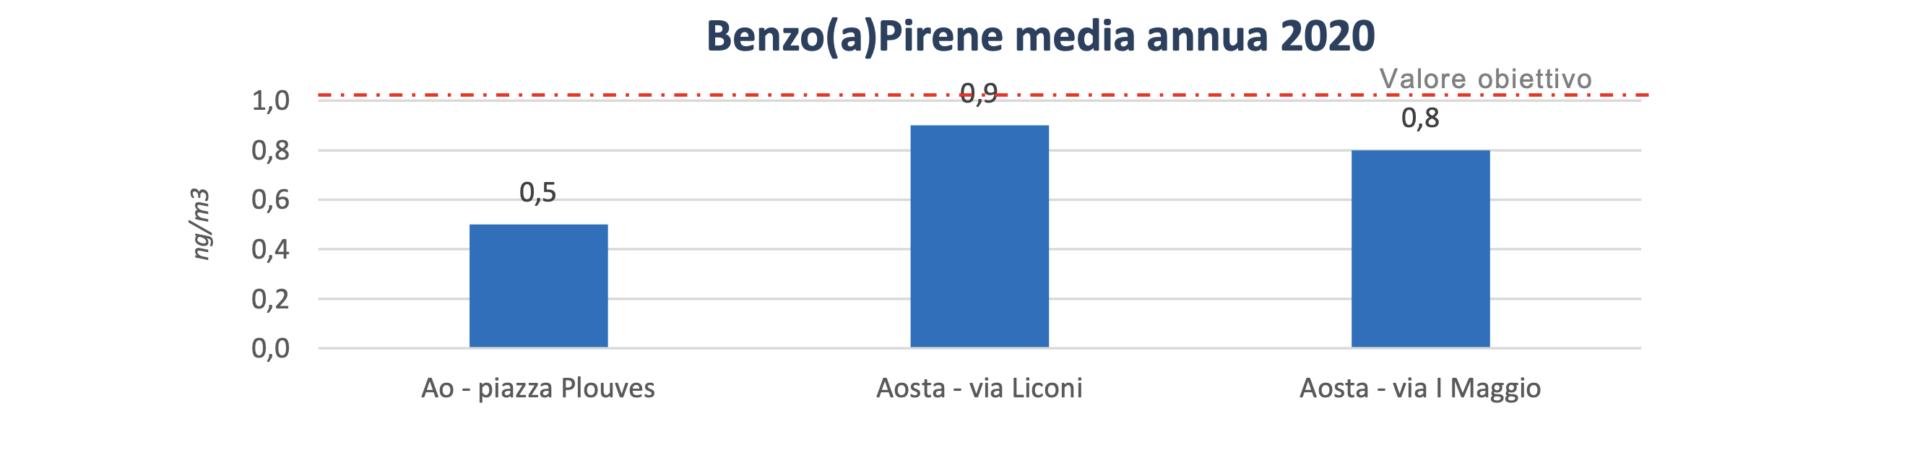 Benzo(a)pirene